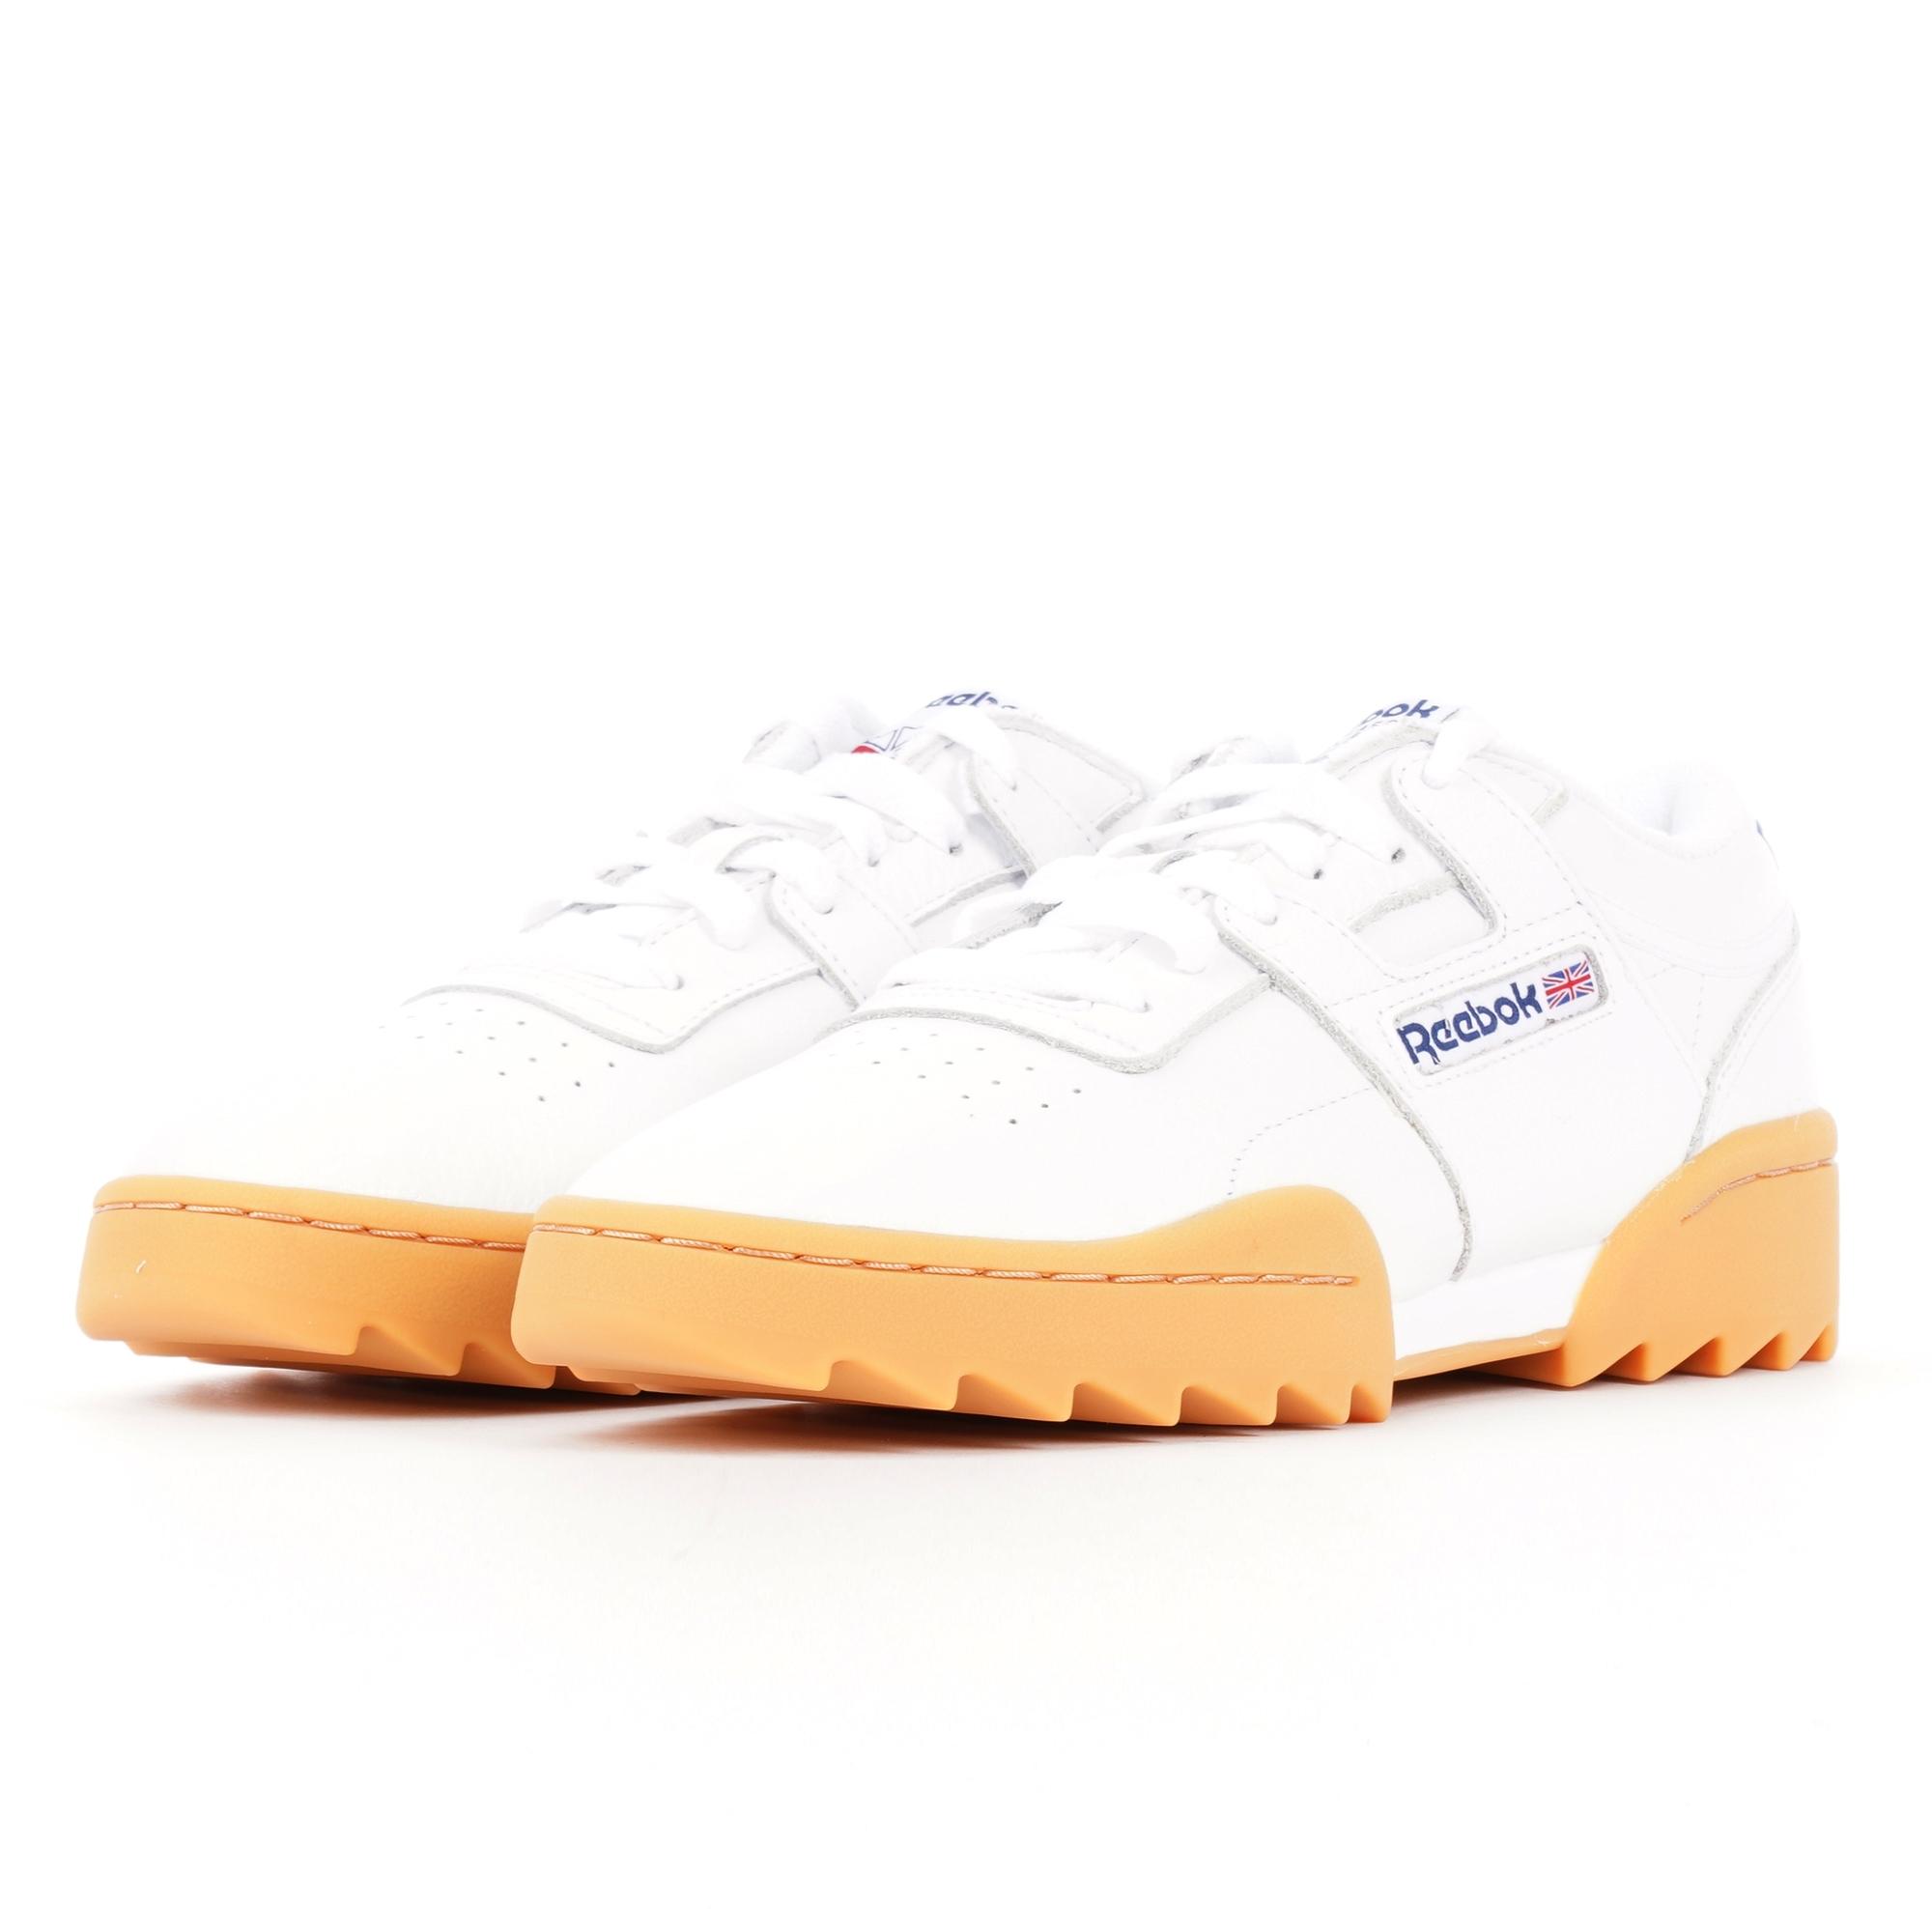 Reebok Workout Ripple OG | White, Dark